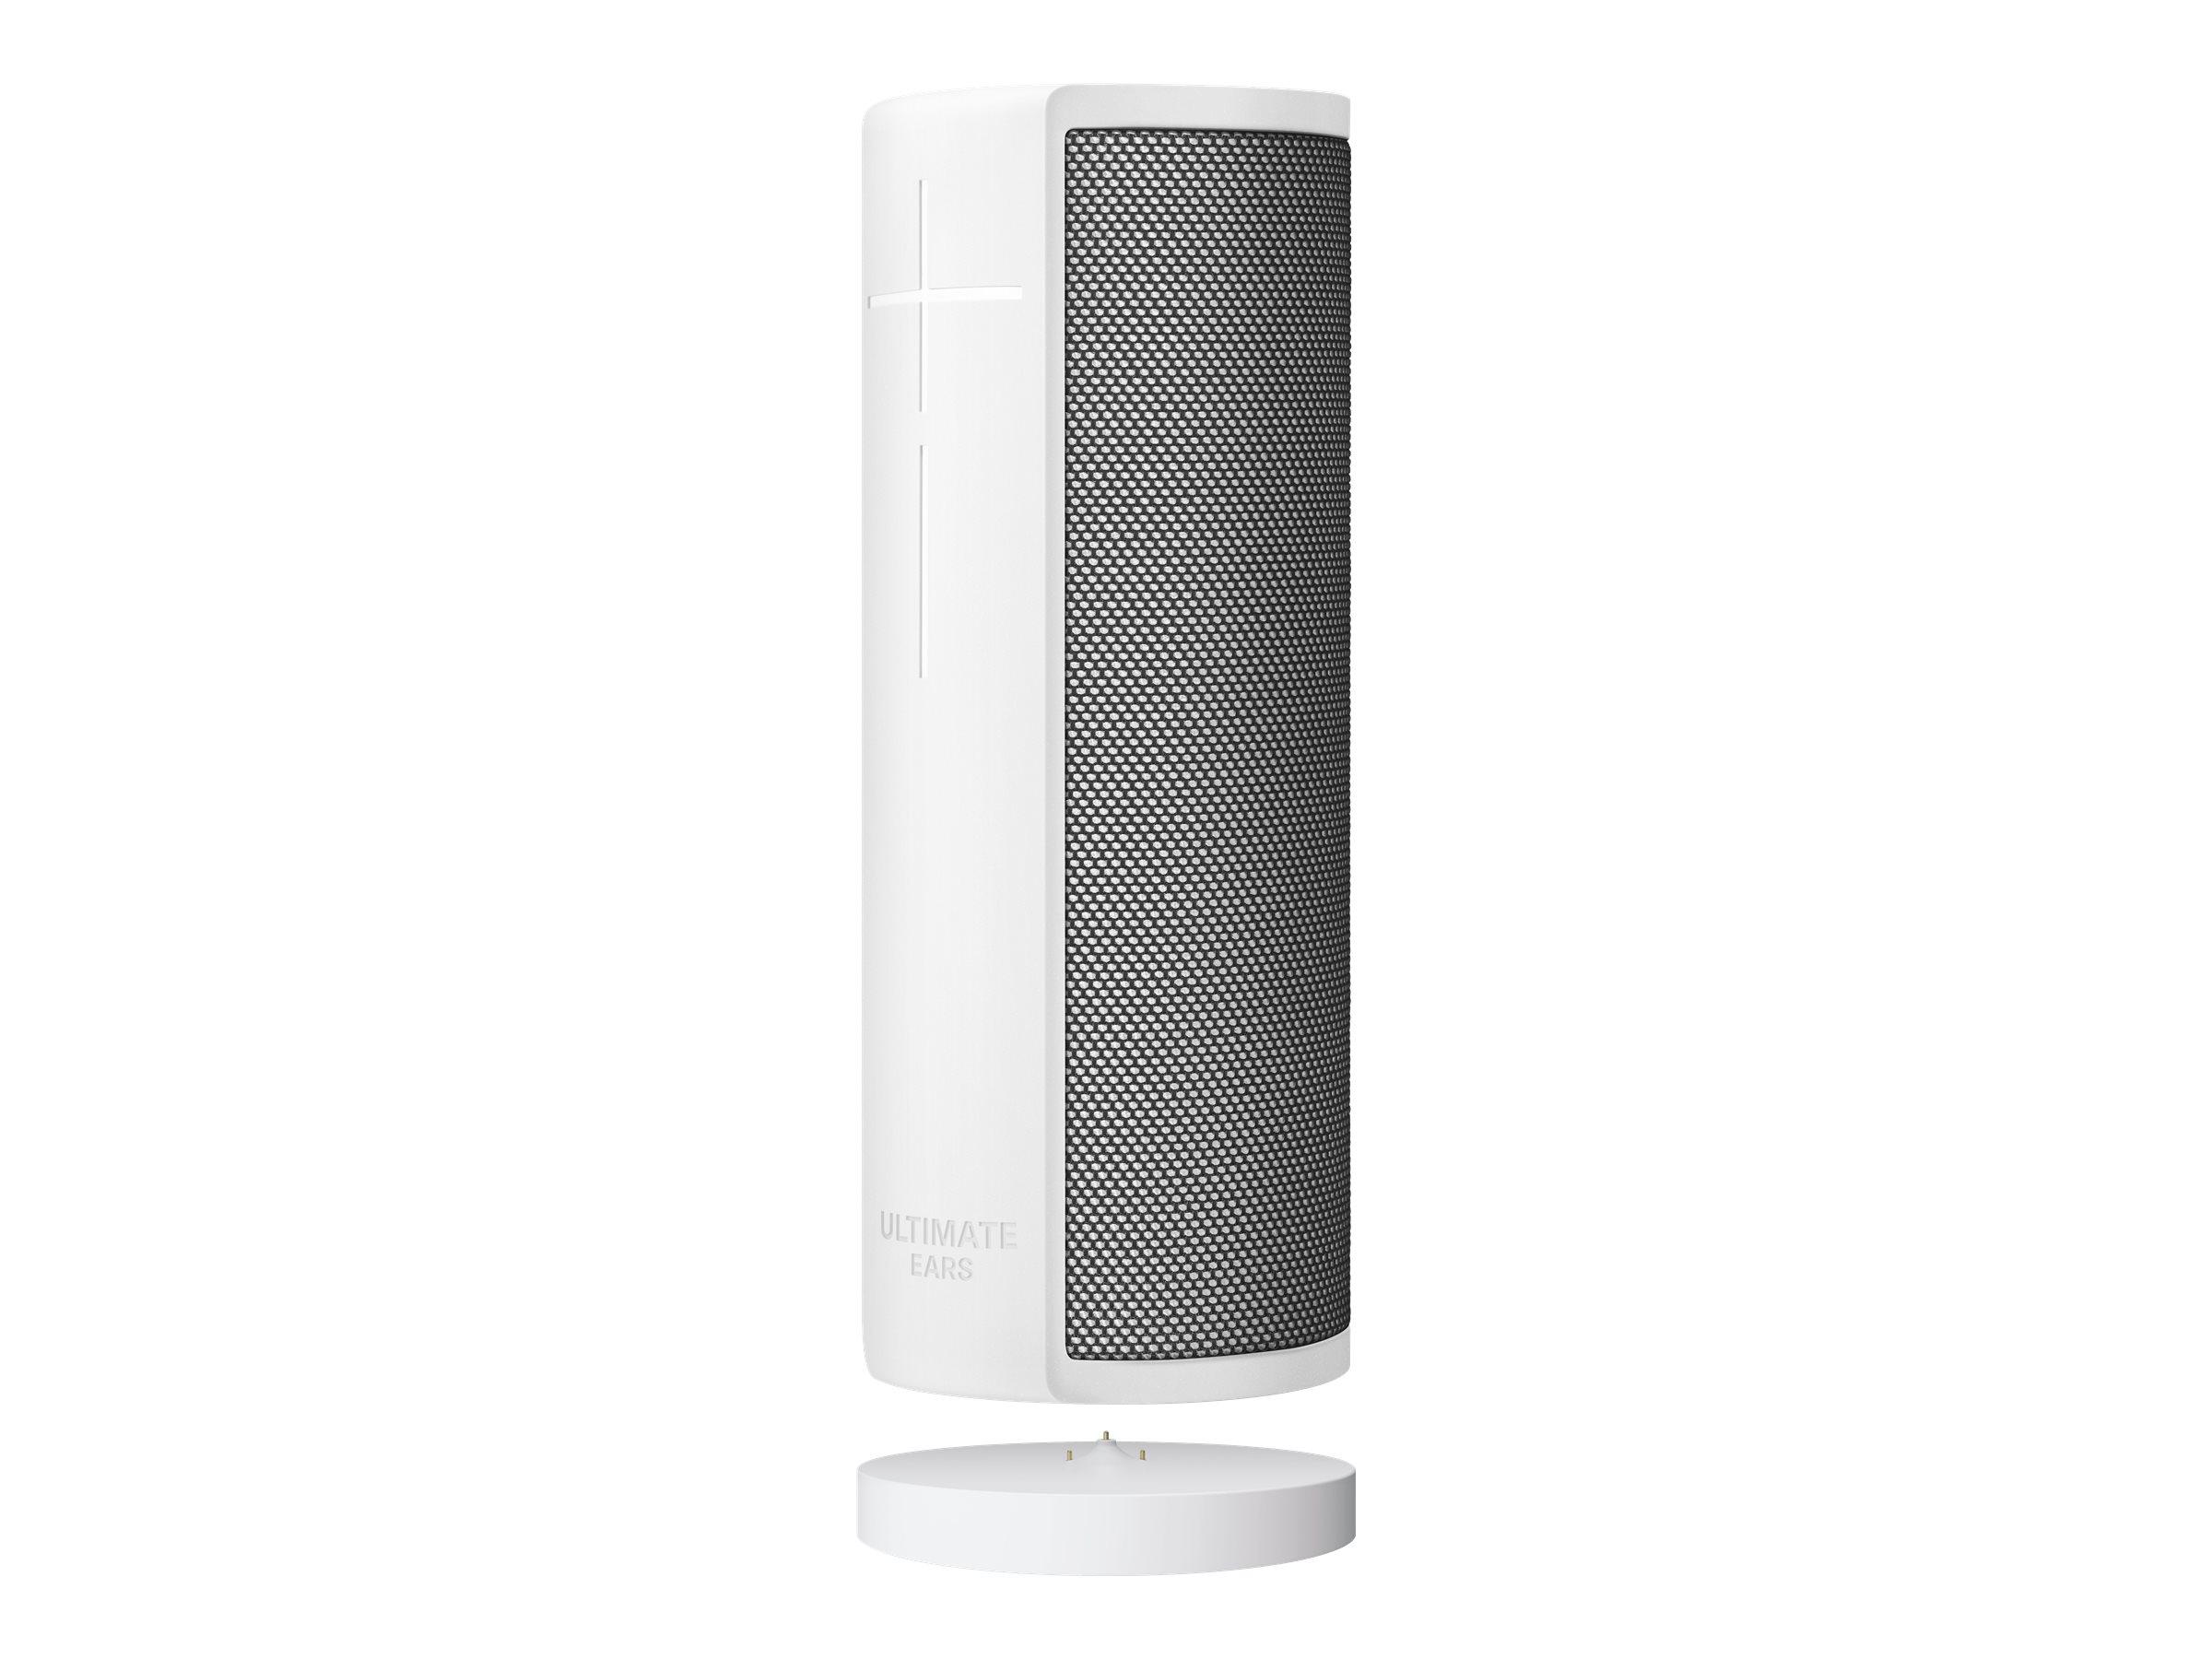 Ultimate Ears MEGABLAST - Lautsprecher - tragbar - kabellos - Bluetooth, Wi-Fi - weiss